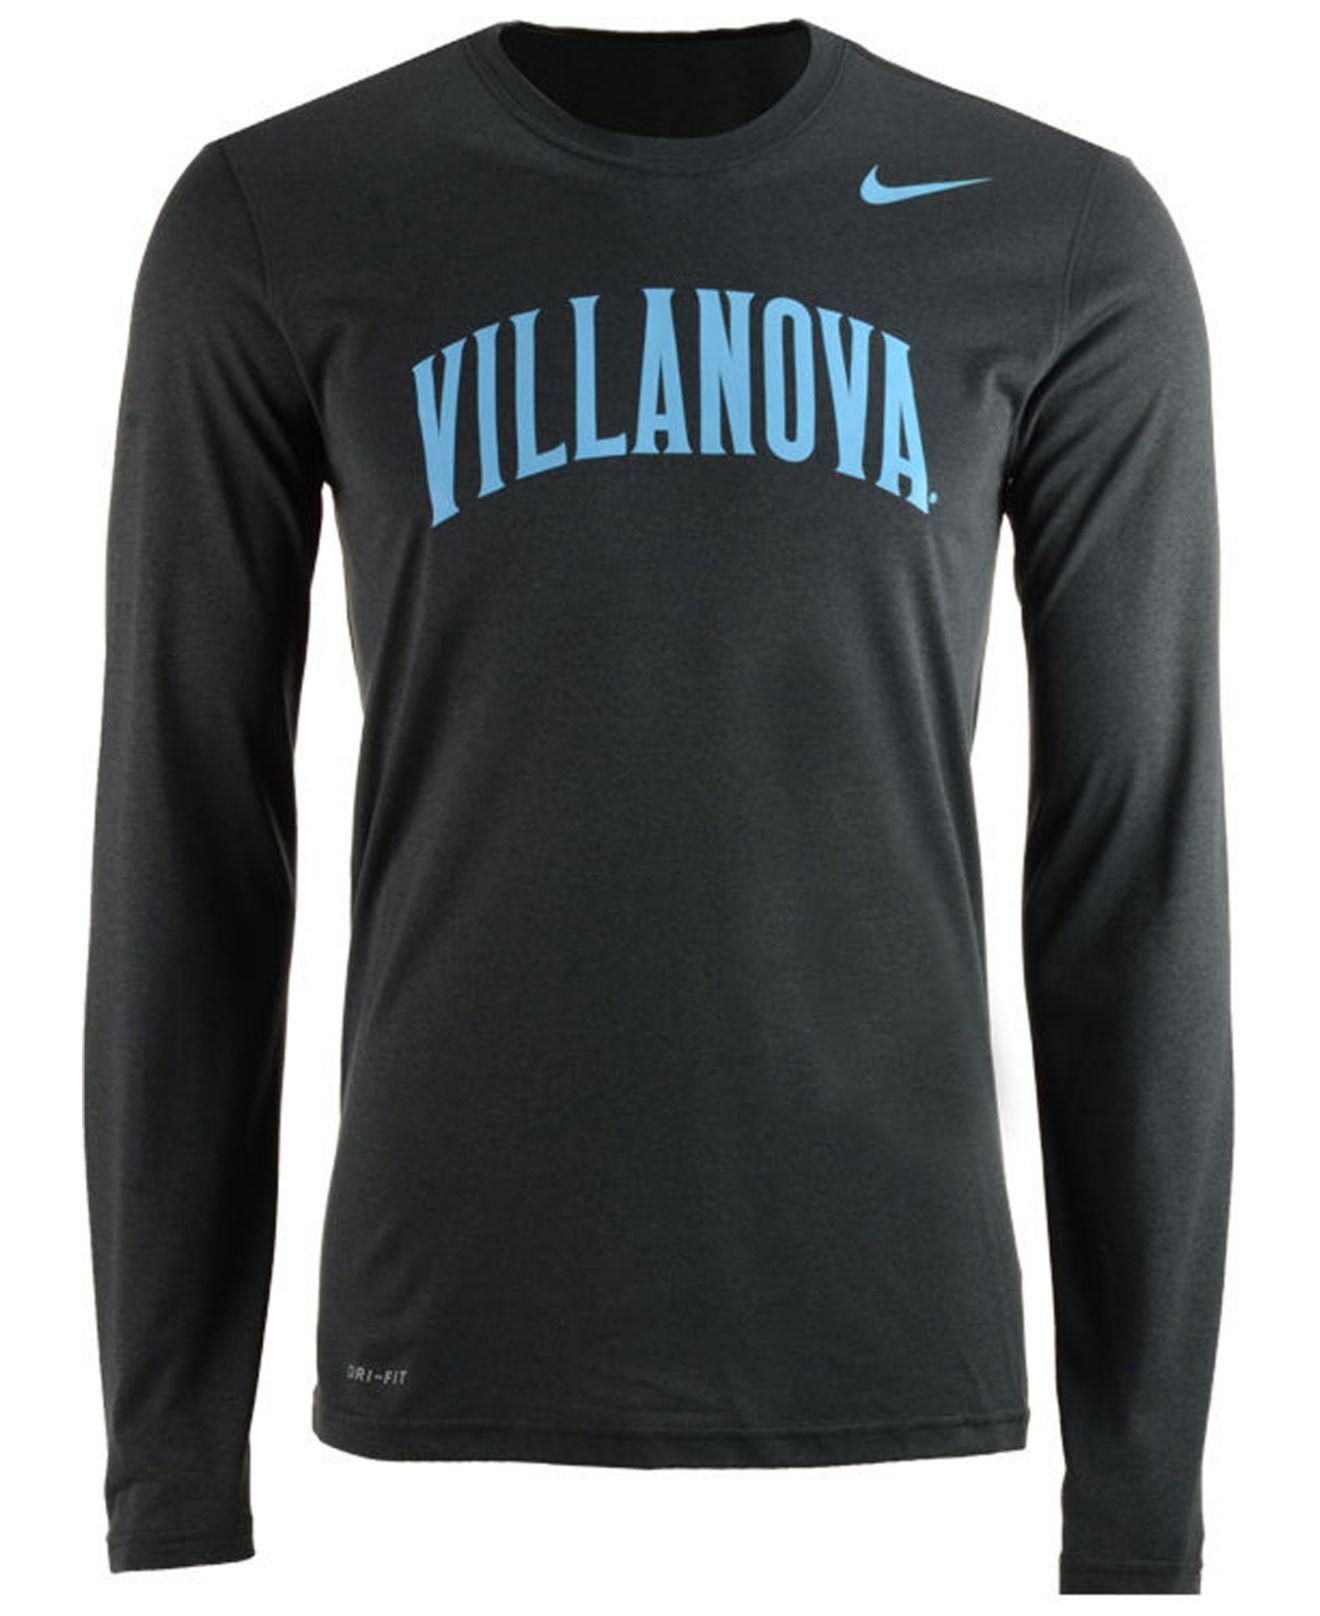 0b17c0ce Nike. Men's Villanova Wildcats Dri-fit Legend Wordmark Long Sleeve T-shirt